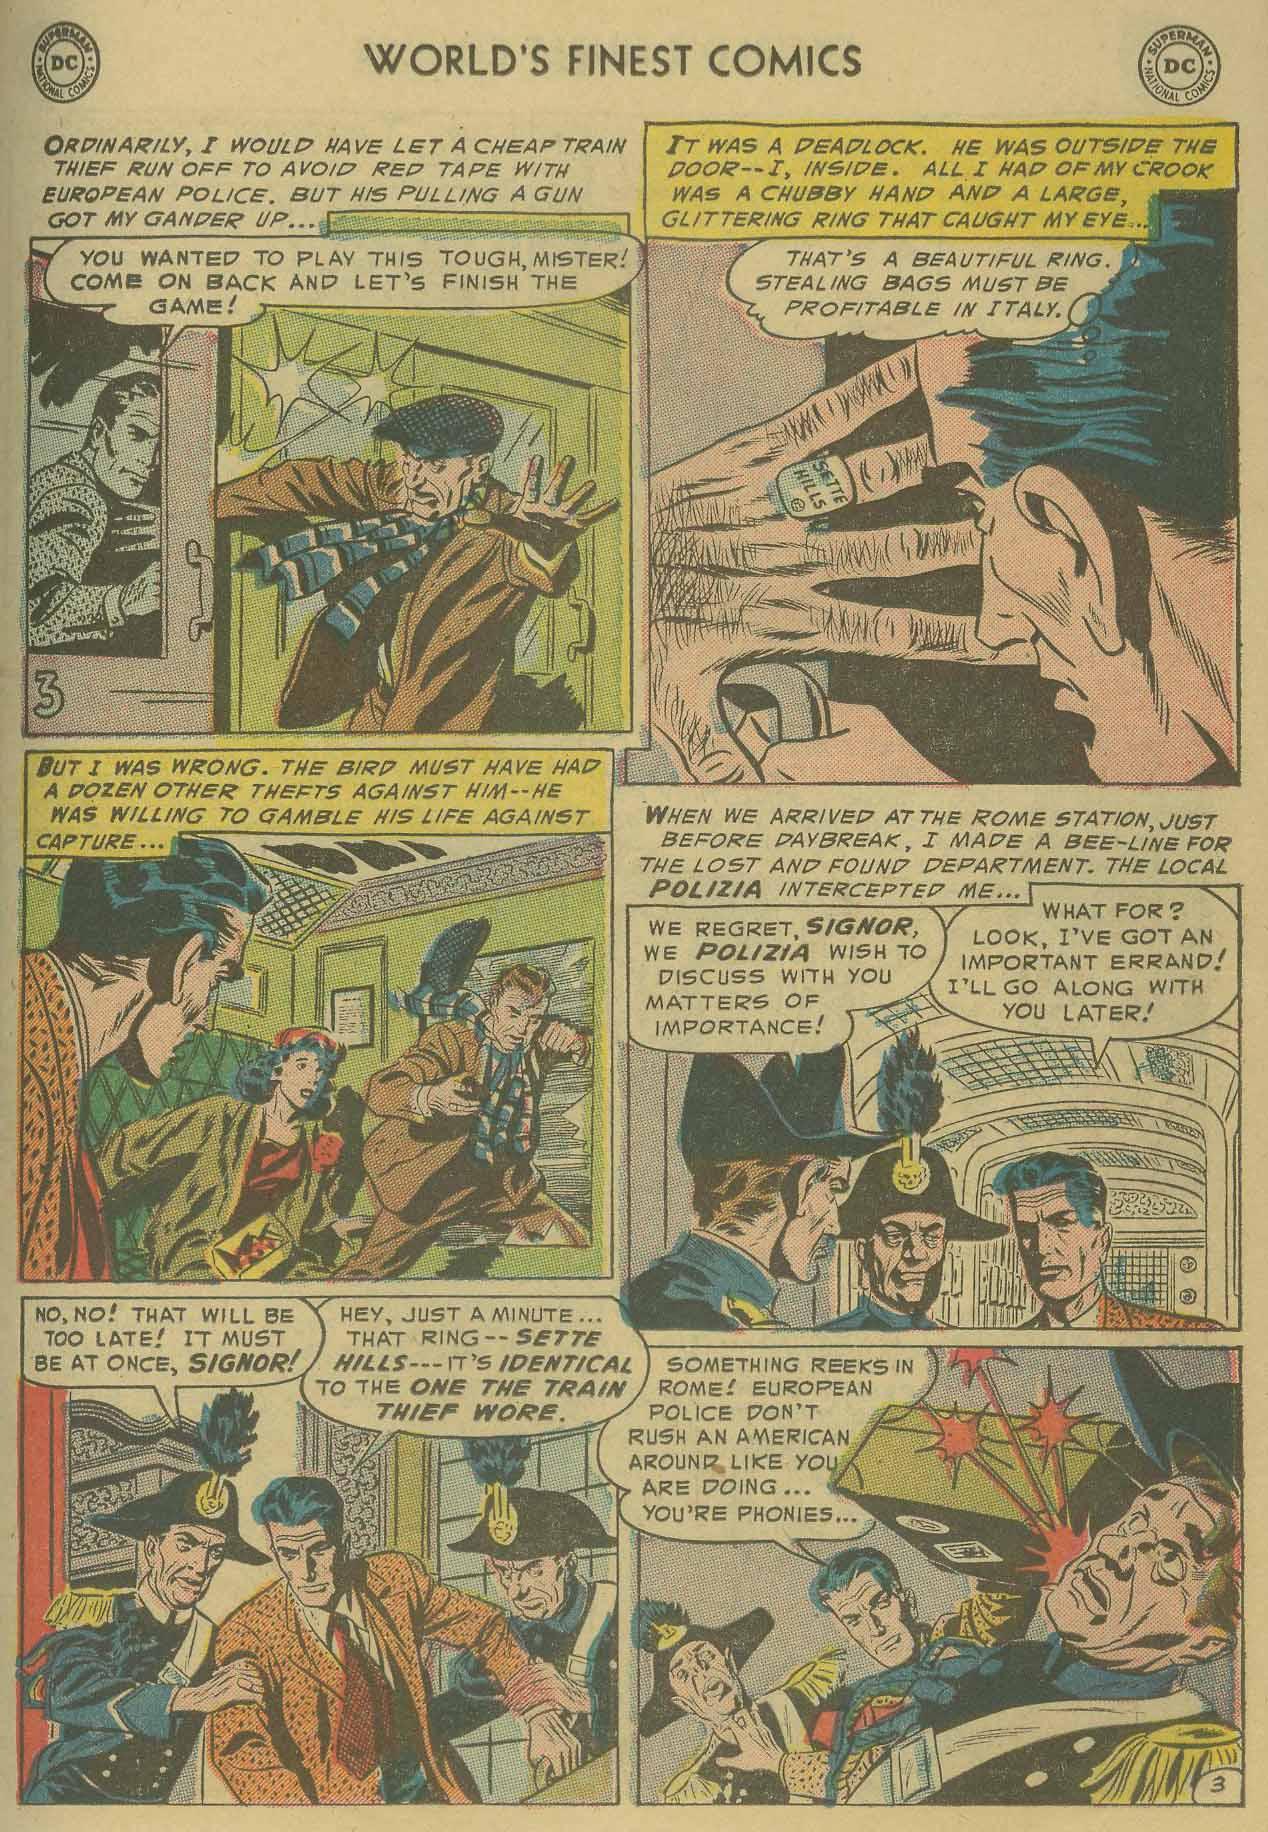 Read online World's Finest Comics comic -  Issue #69 - 45